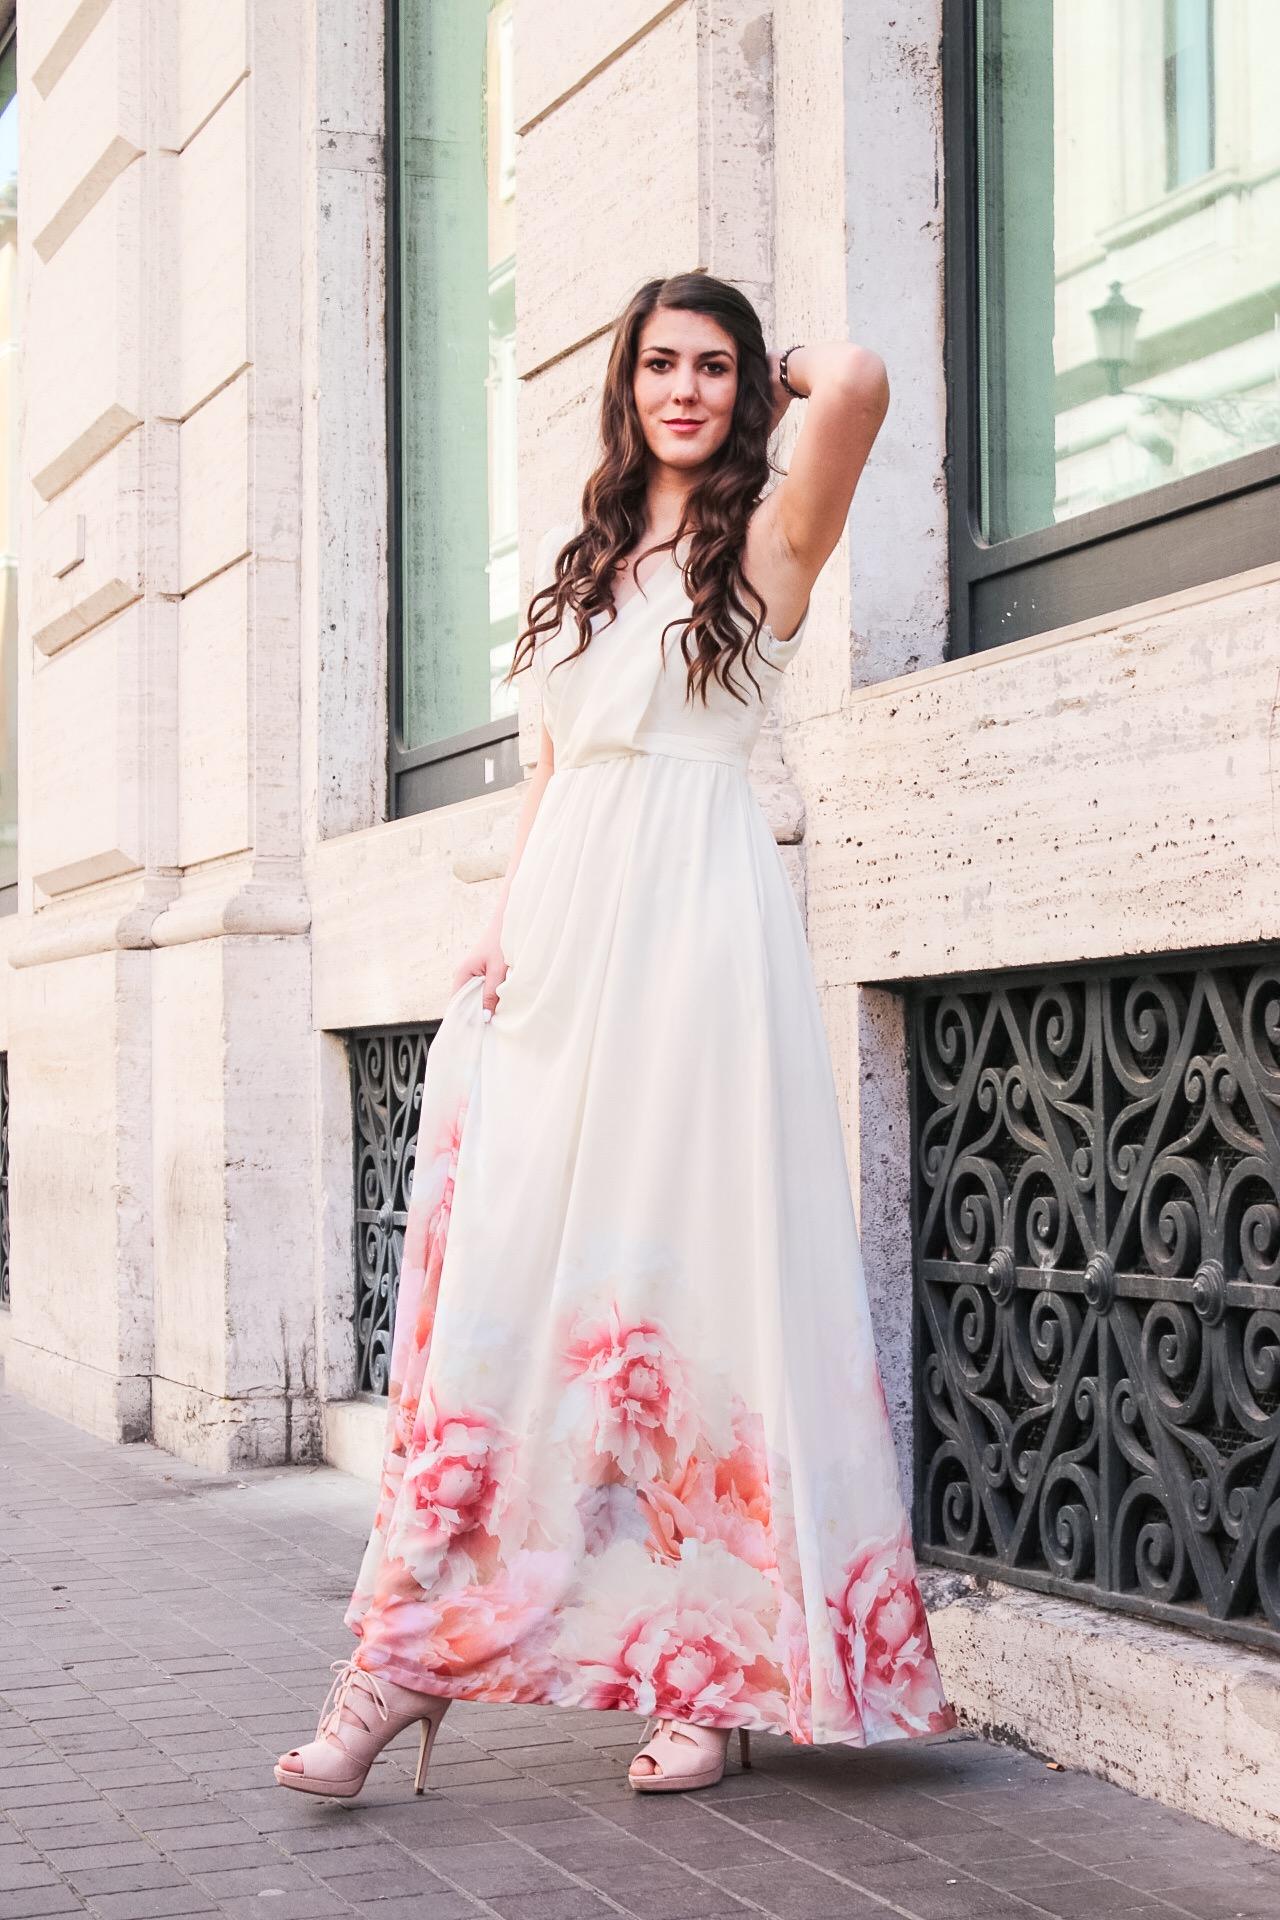 glamour_roma_142.JPG